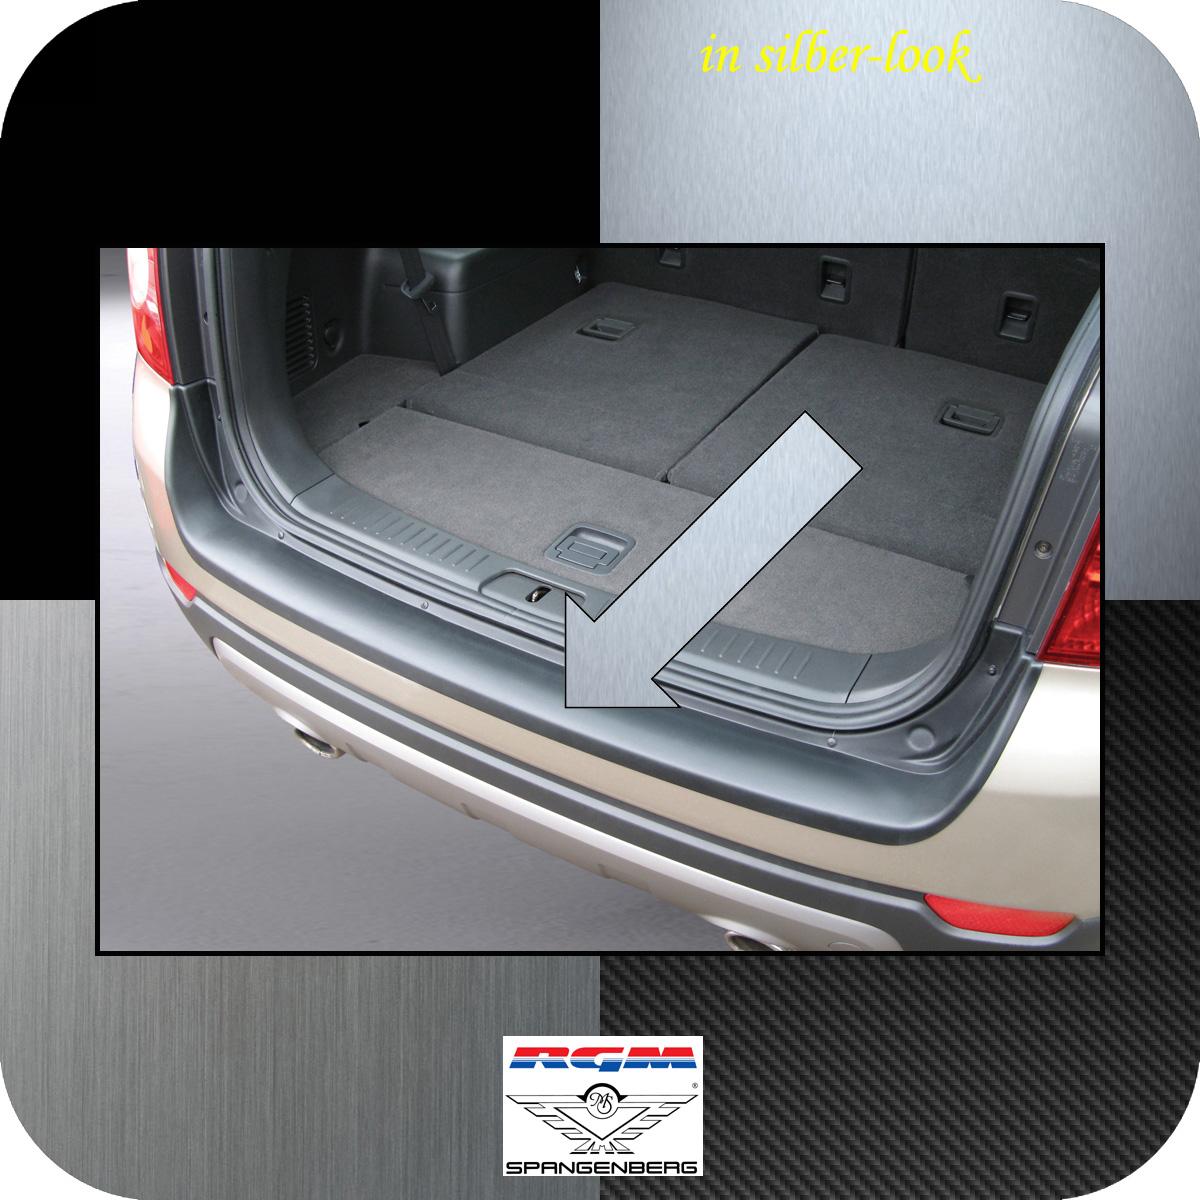 Ladekantenschutz Silber-Look Chevrolet Captiva SUV 4X4 vor Mopf 2006-13 3506322